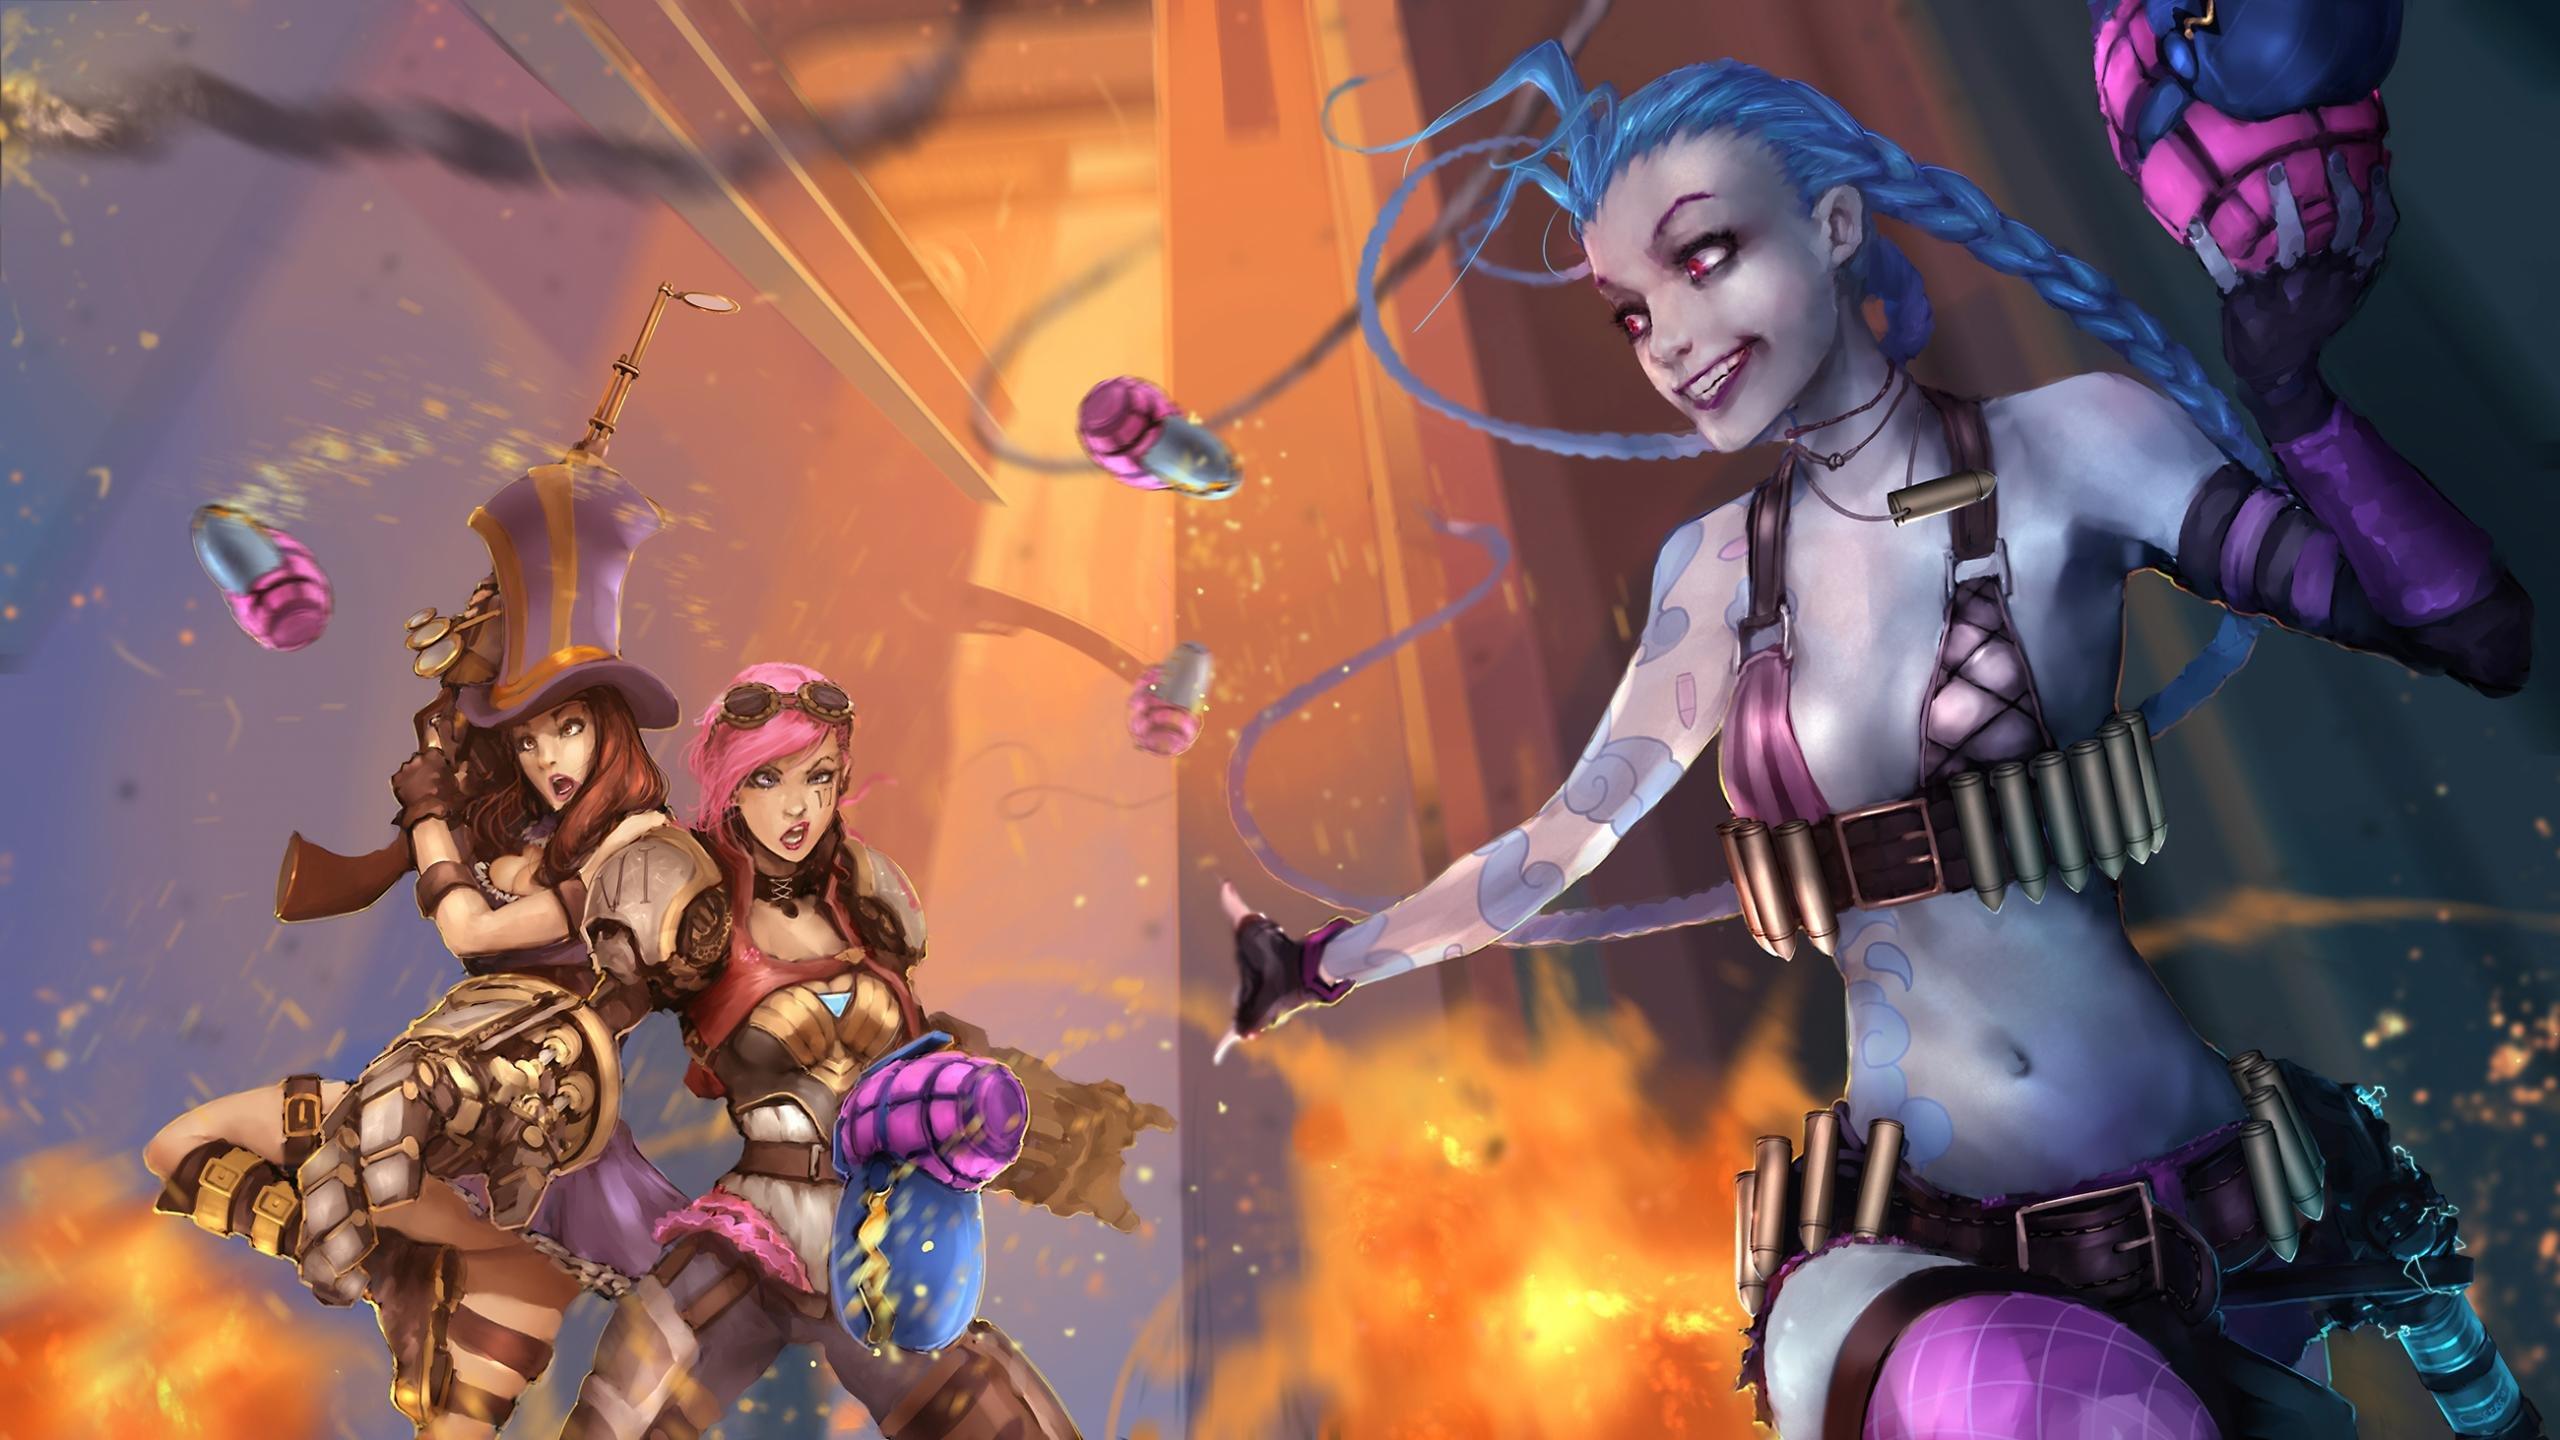 Caitlyn League Of Legends Wallpapers 2560x1440 Desktop Backgrounds